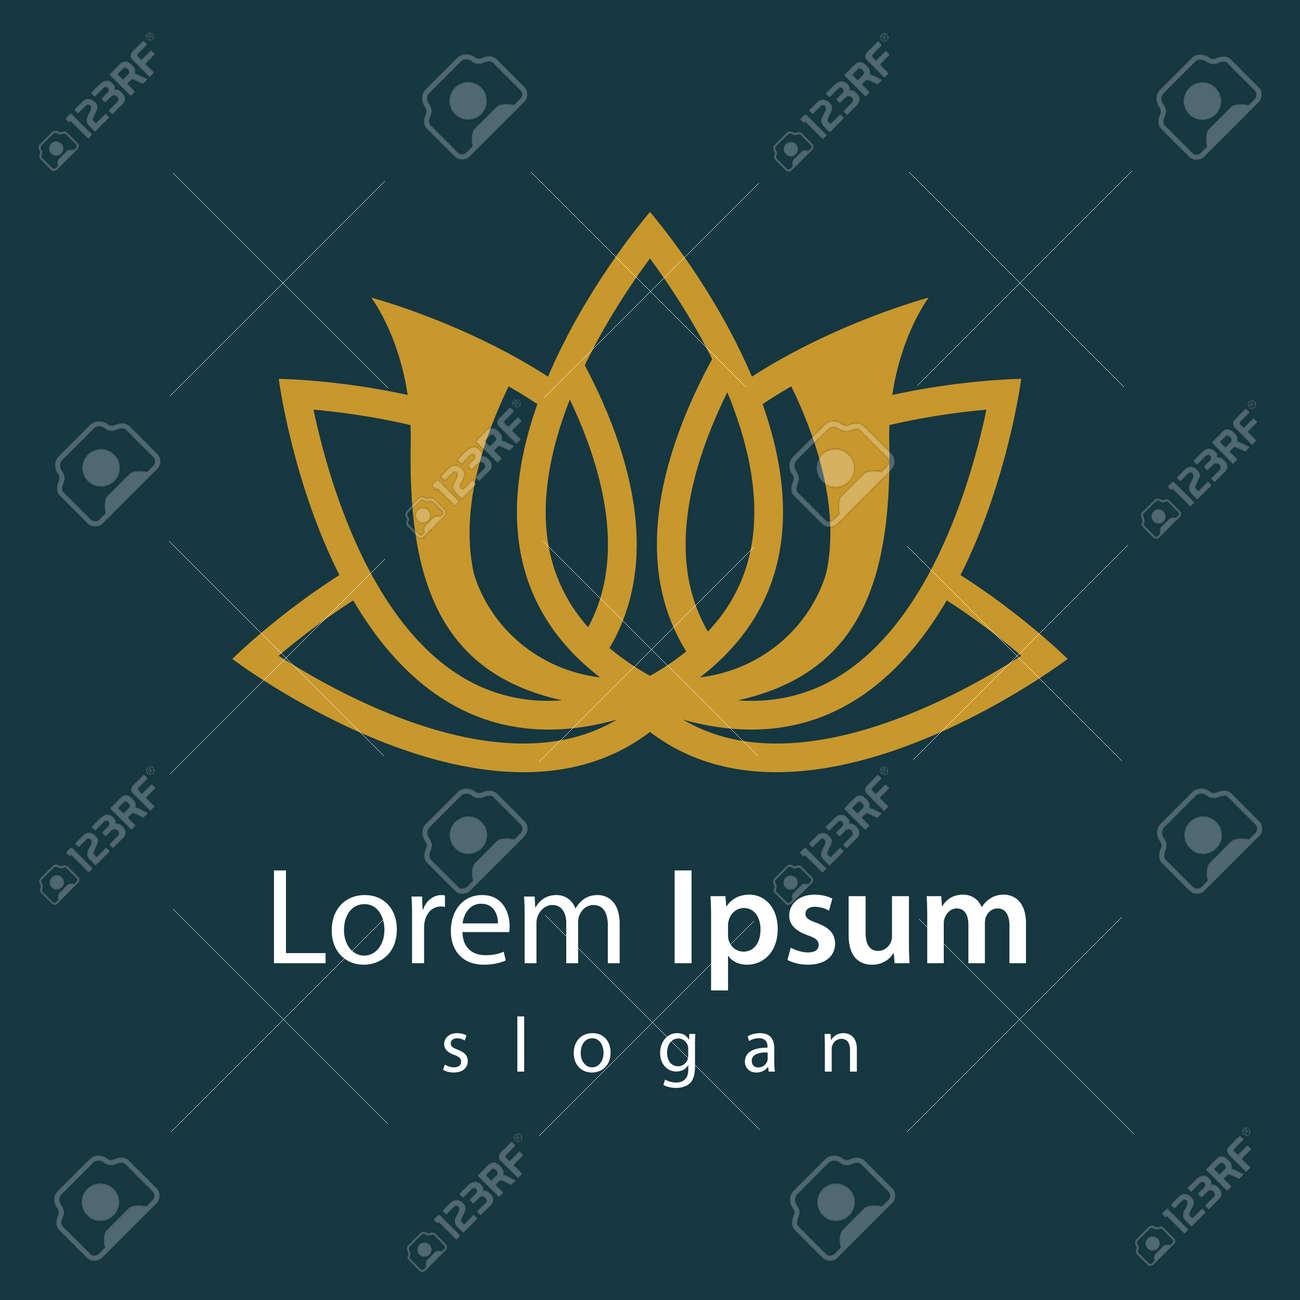 Beauty lotus logo images illustration design - 167448832